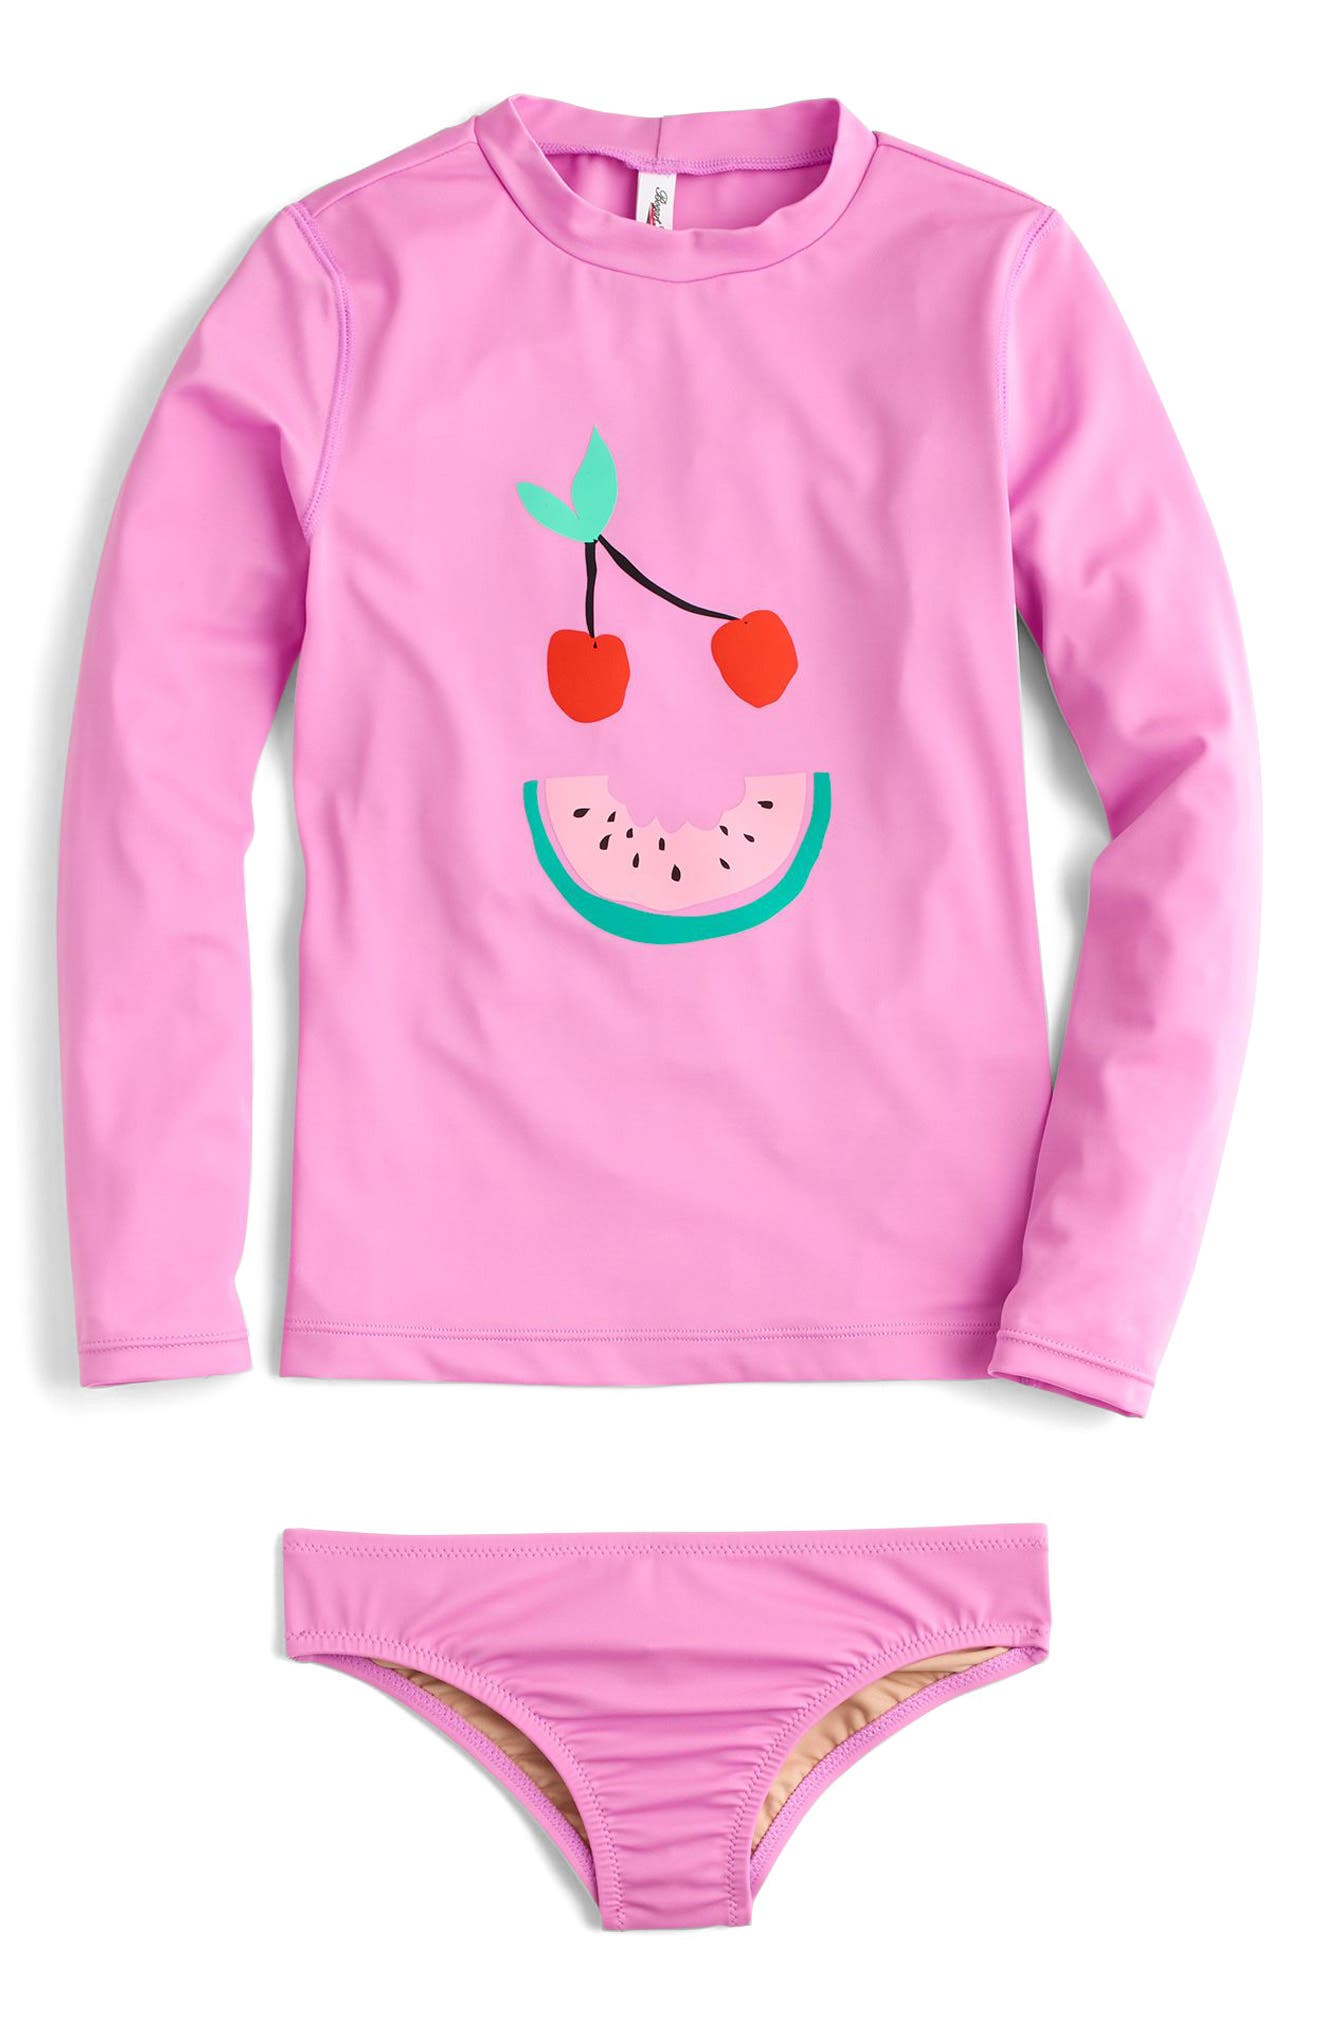 Fruit Face Two-Piece Rashguard Swimsuit,                             Main thumbnail 1, color,                             650